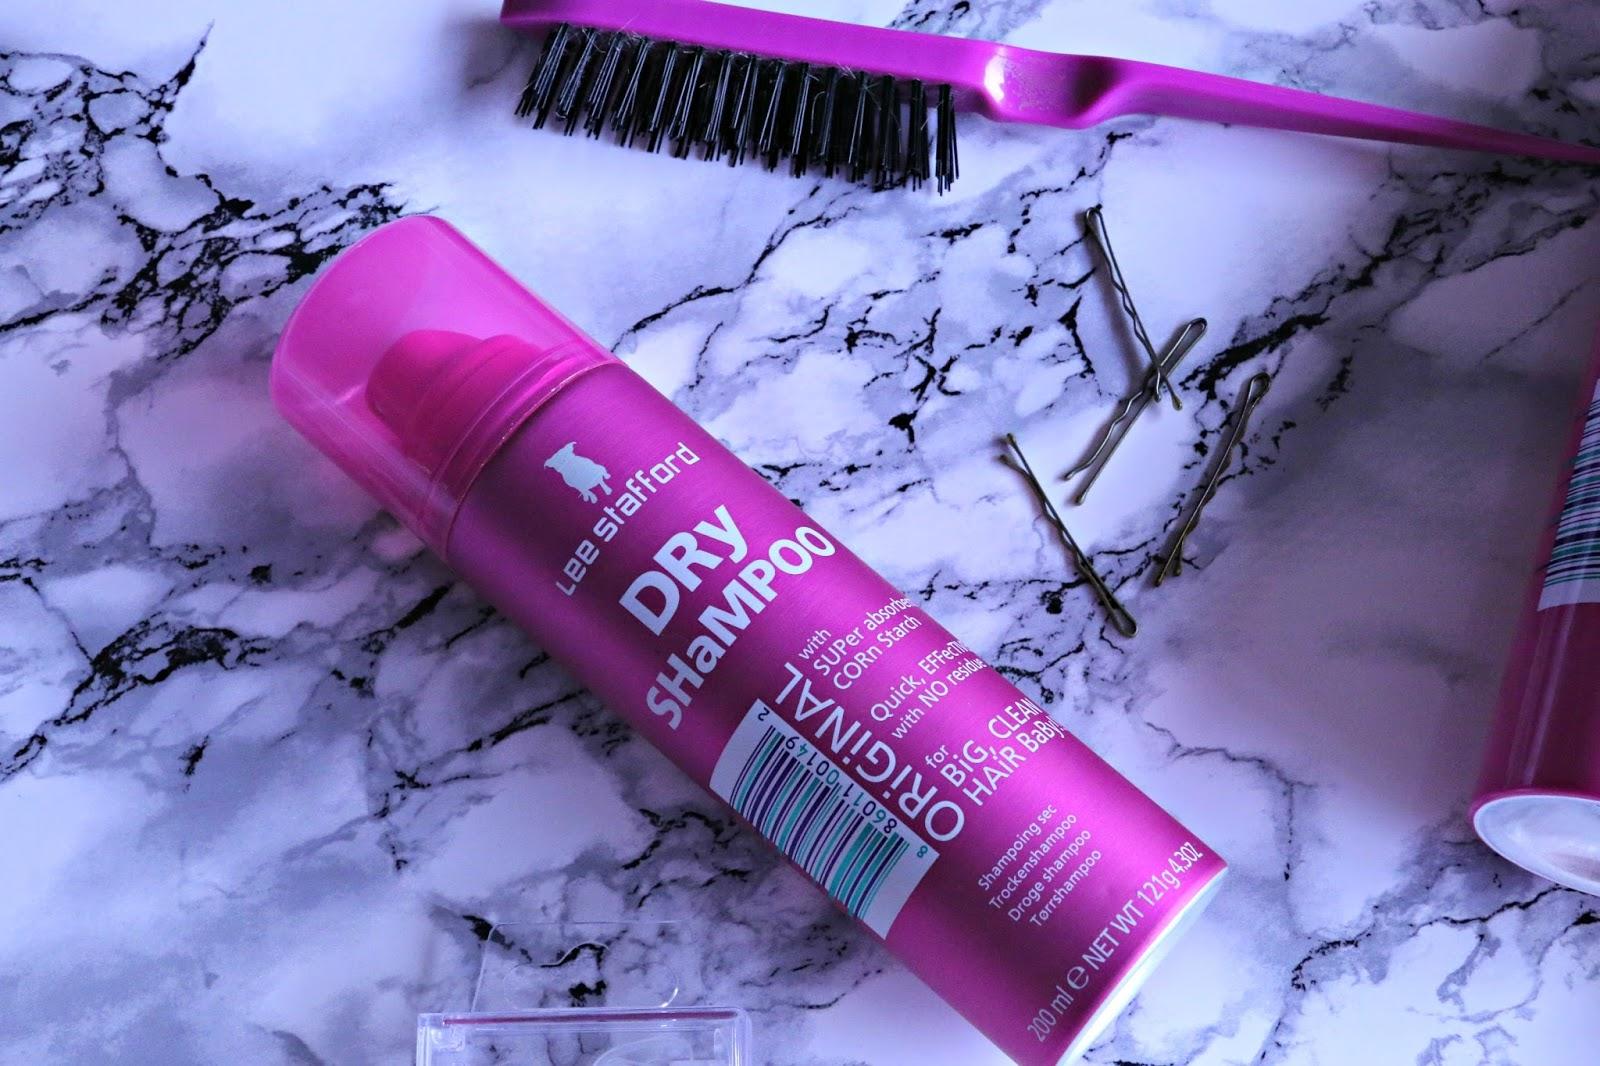 How to Create Unicorn Braids Lee Stafford Original Dry Shampoo Review Image